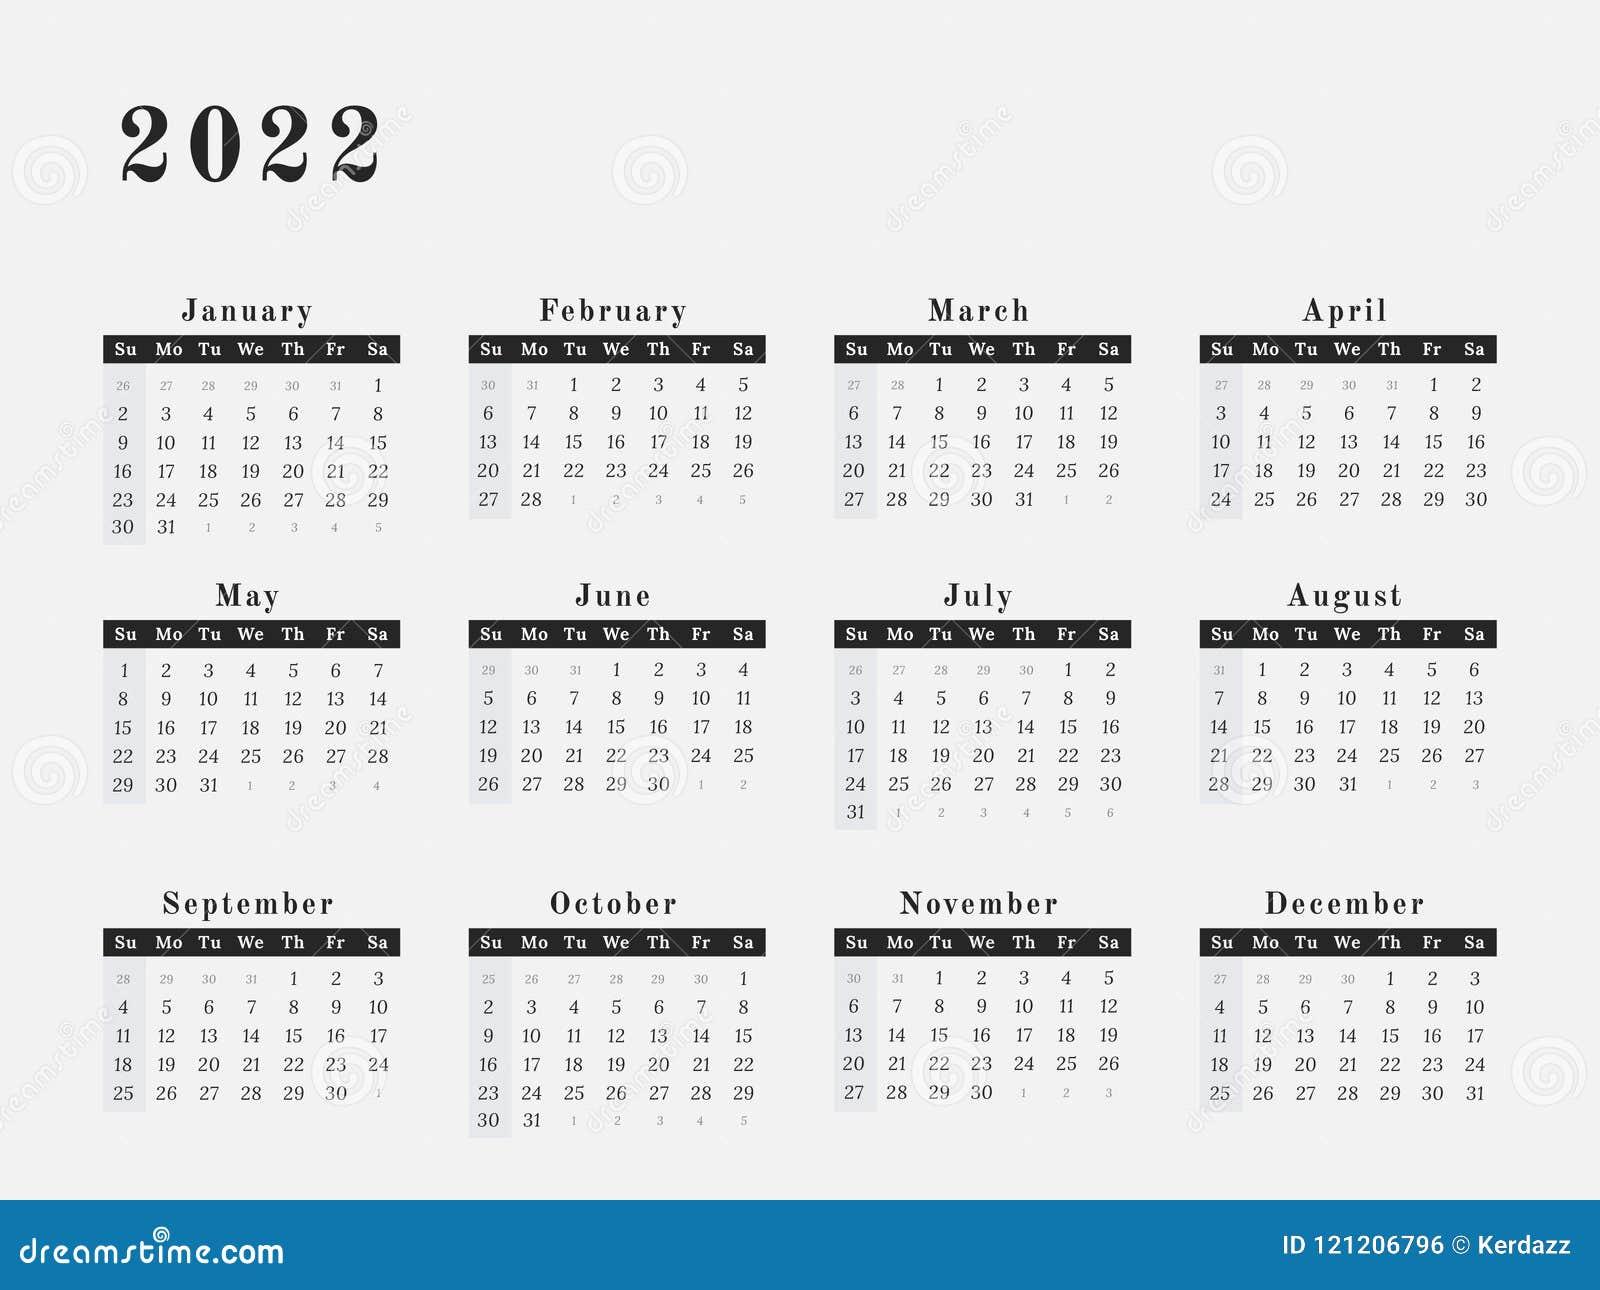 Calendar Year 2022.2022 Year Calendar Horizontal Design Stock Vector Illustration Of Monthly Number 121206796